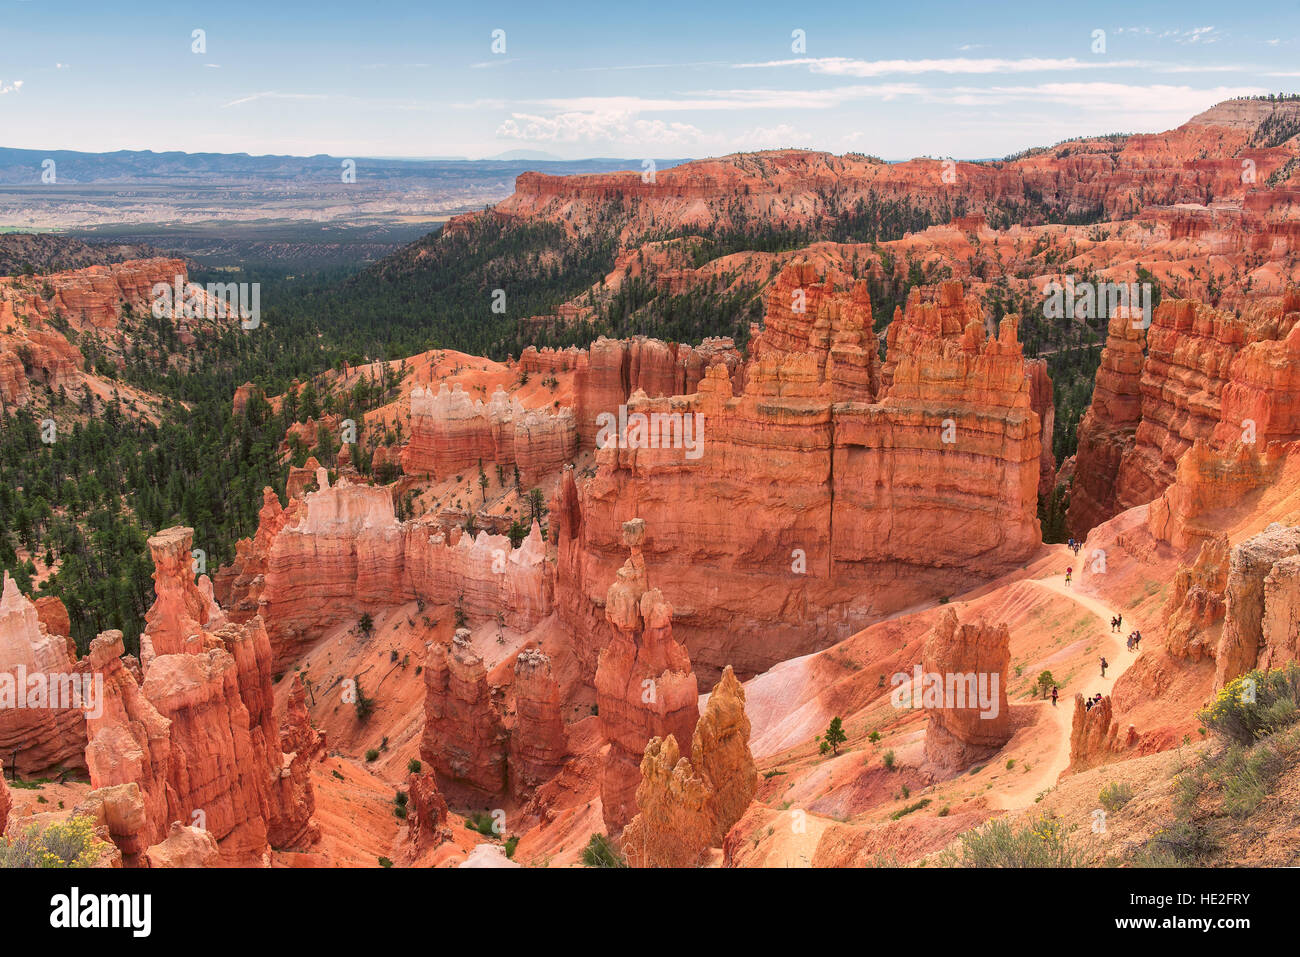 Bryce anfiteatro, parco nazionale di Bryce Canyon, Utah, Stati Uniti d'America Immagini Stock